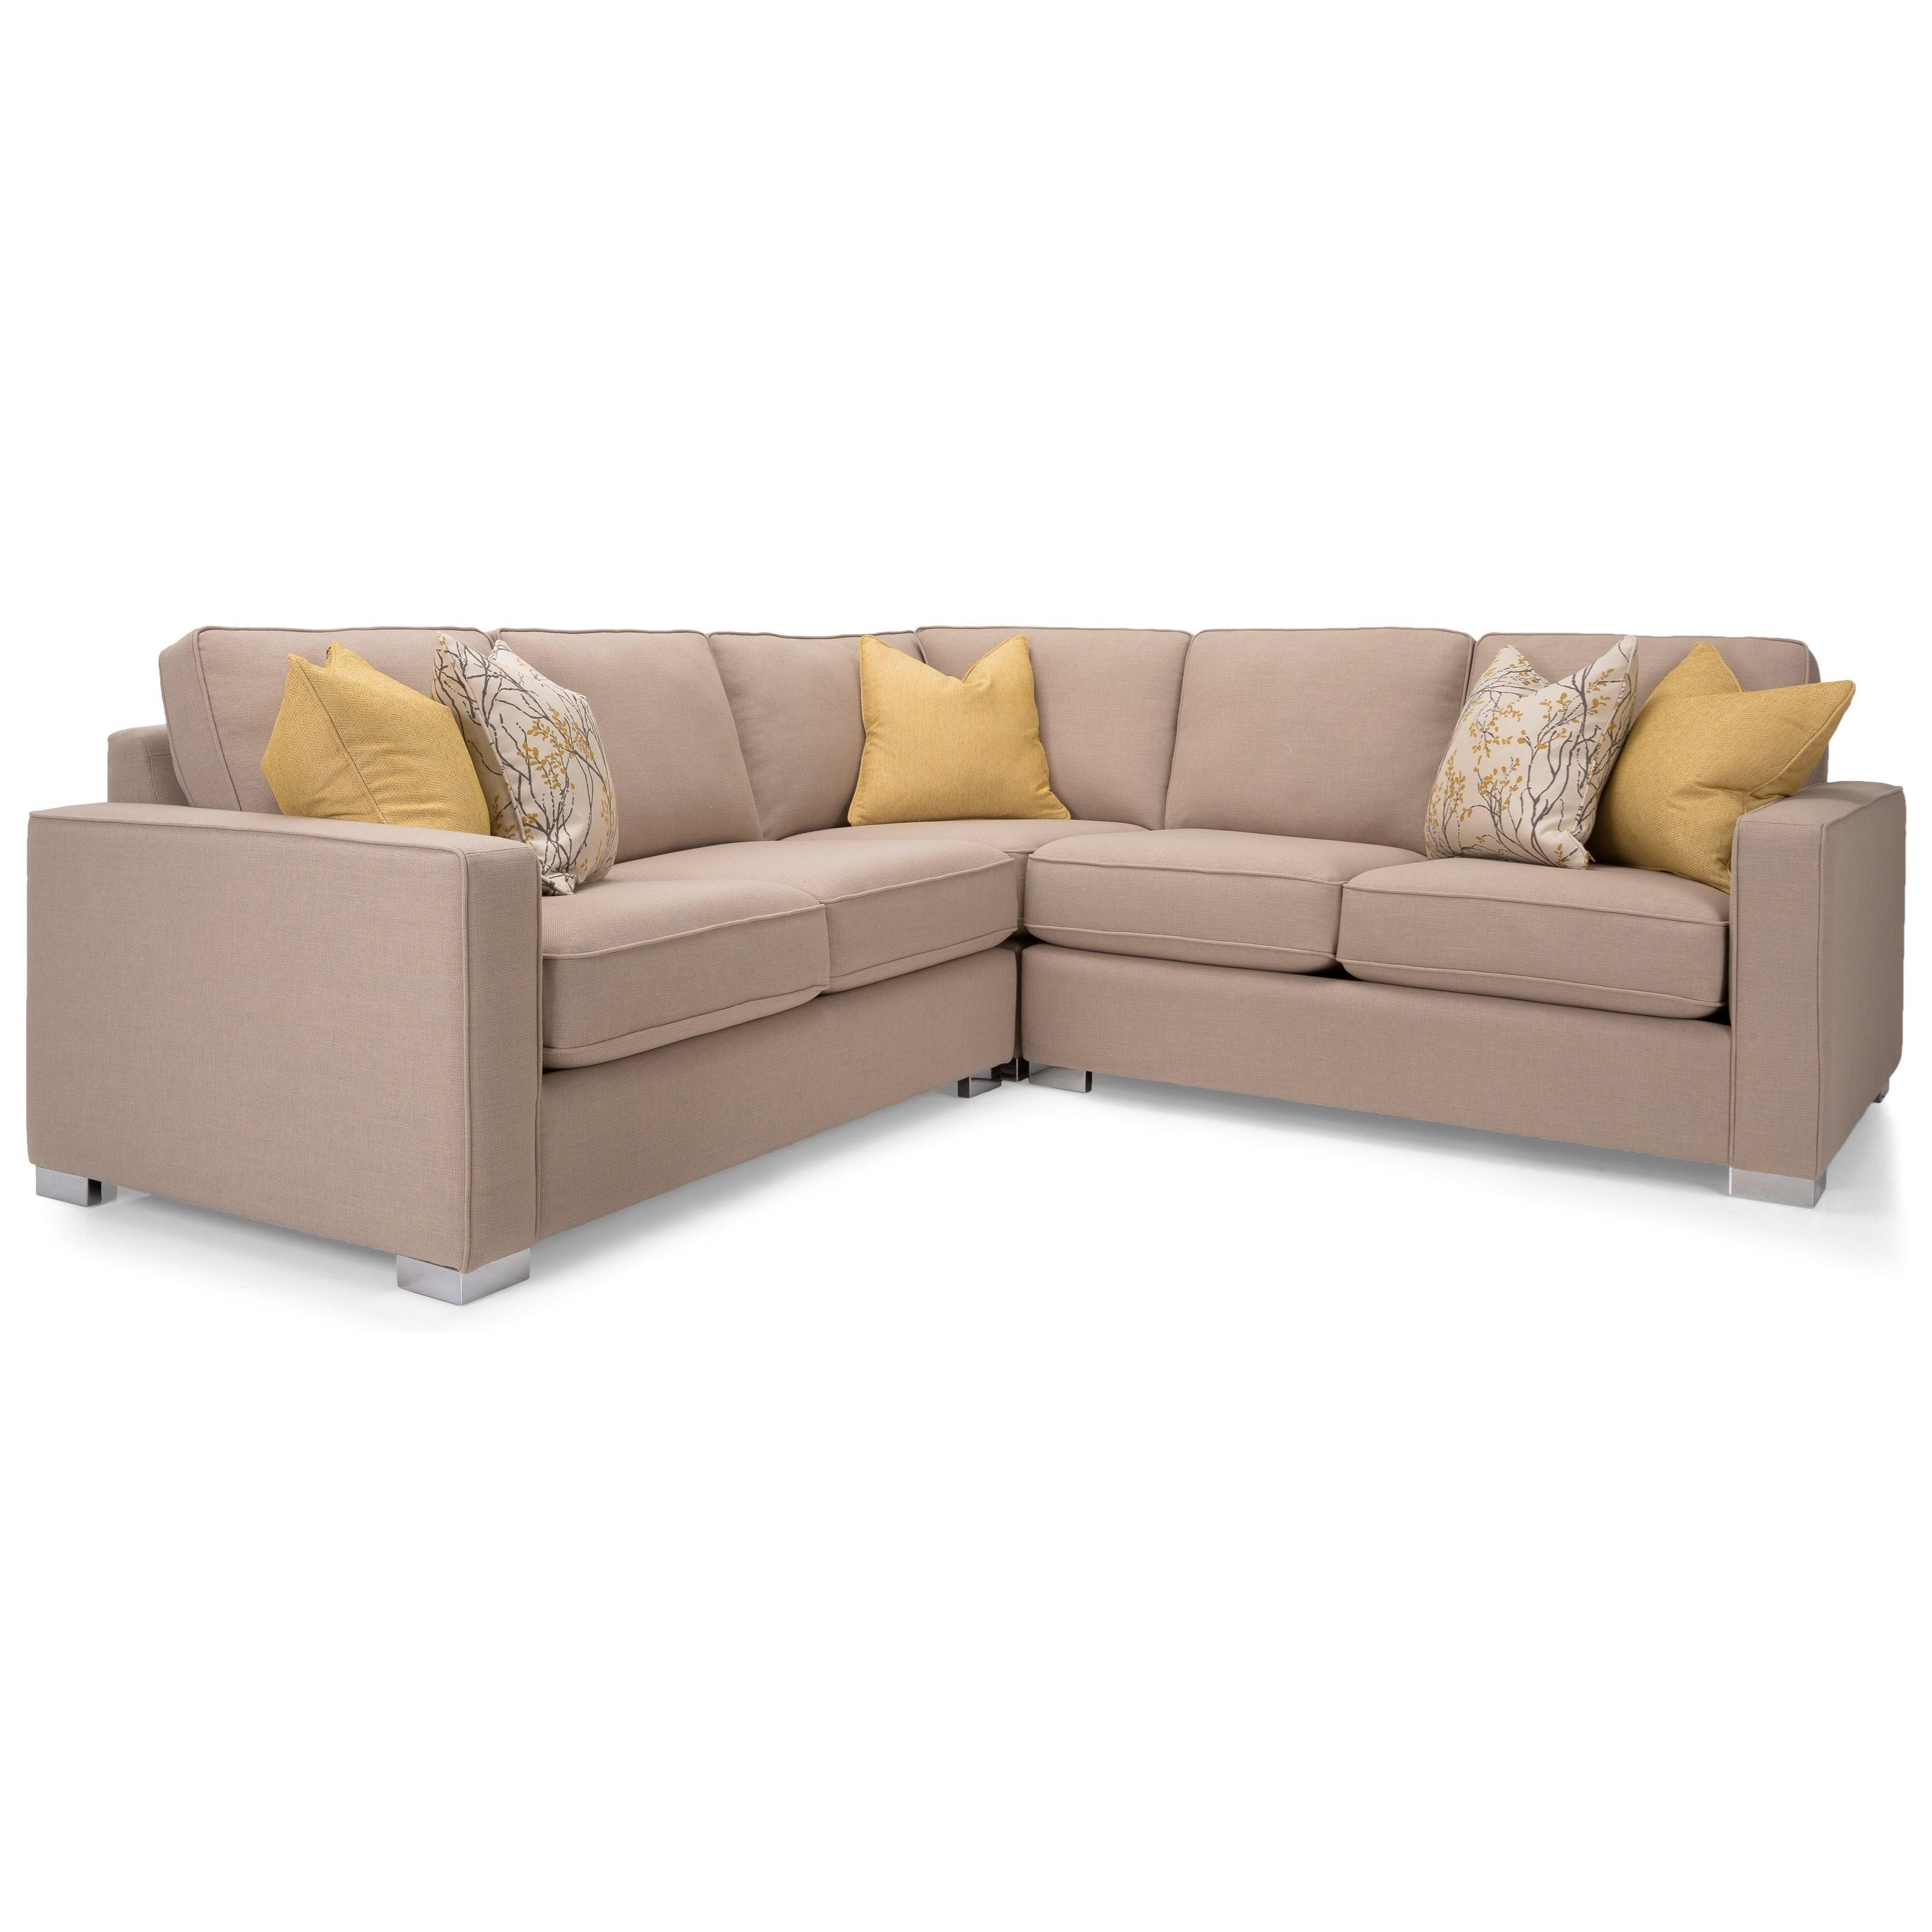 Decor rest 7743 three piece corner sectional sofa stoney for 3 piece corner sectional sofa